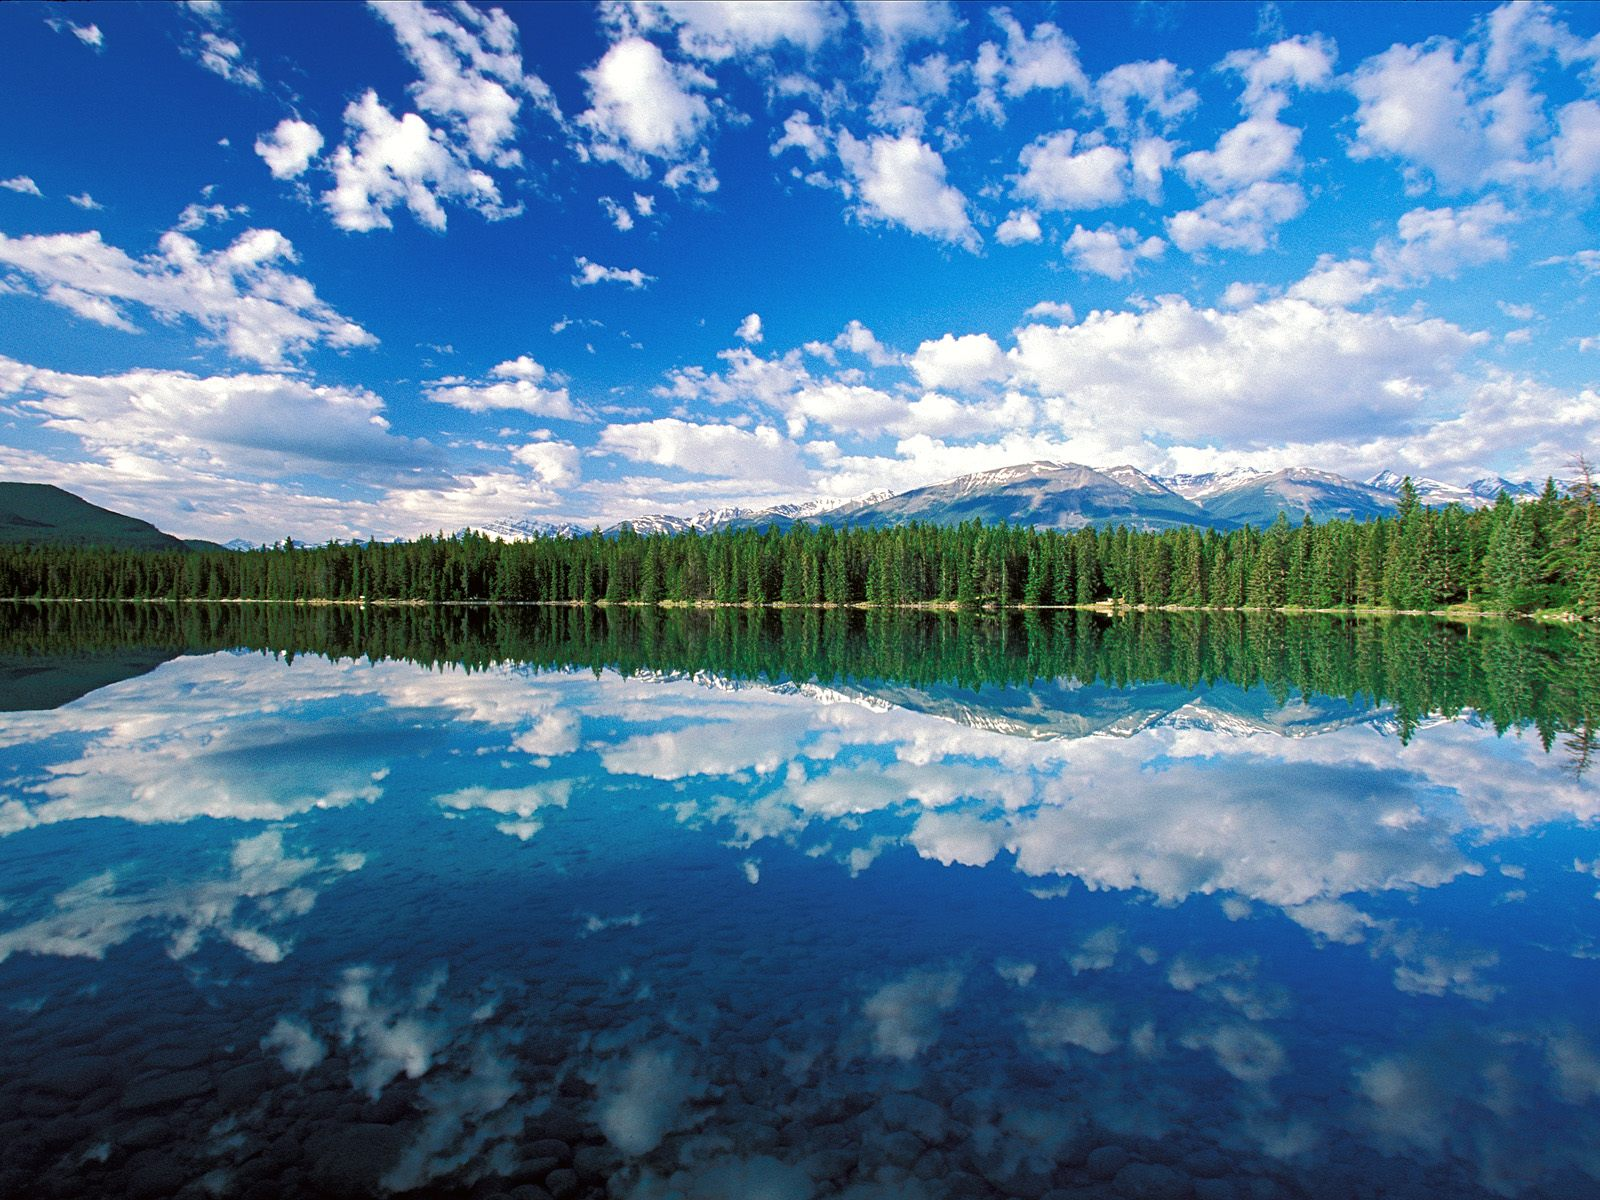 Edith Lake Jasper National Park Canada Wallpapers HD Wallpapers 1600x1200